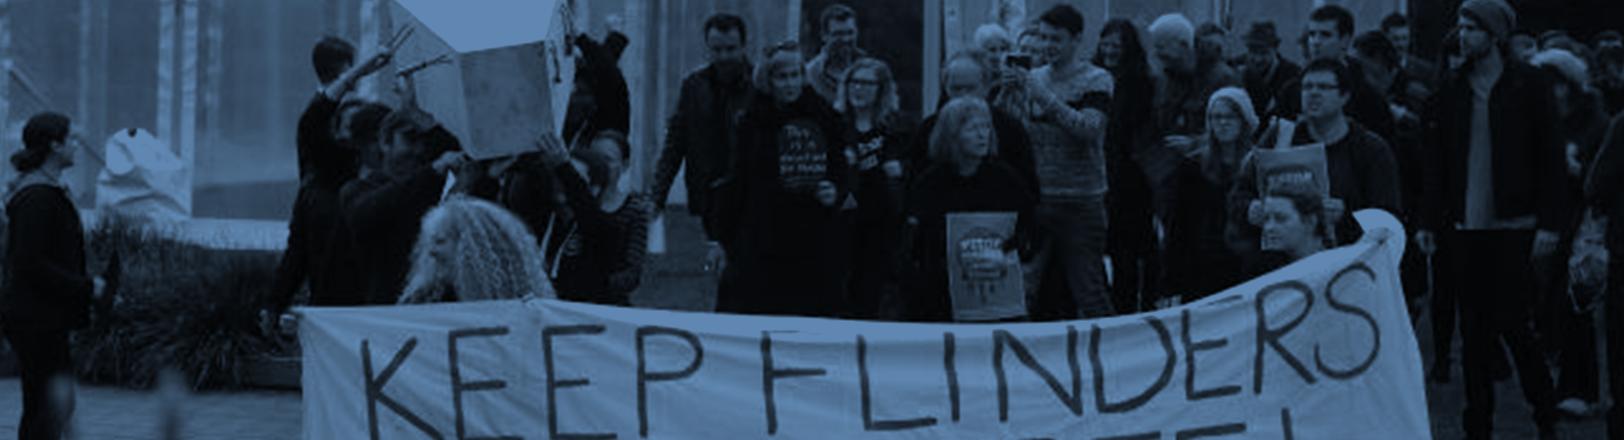 Open Letter to Flinders Uni - Keep Us Bjorn-Free